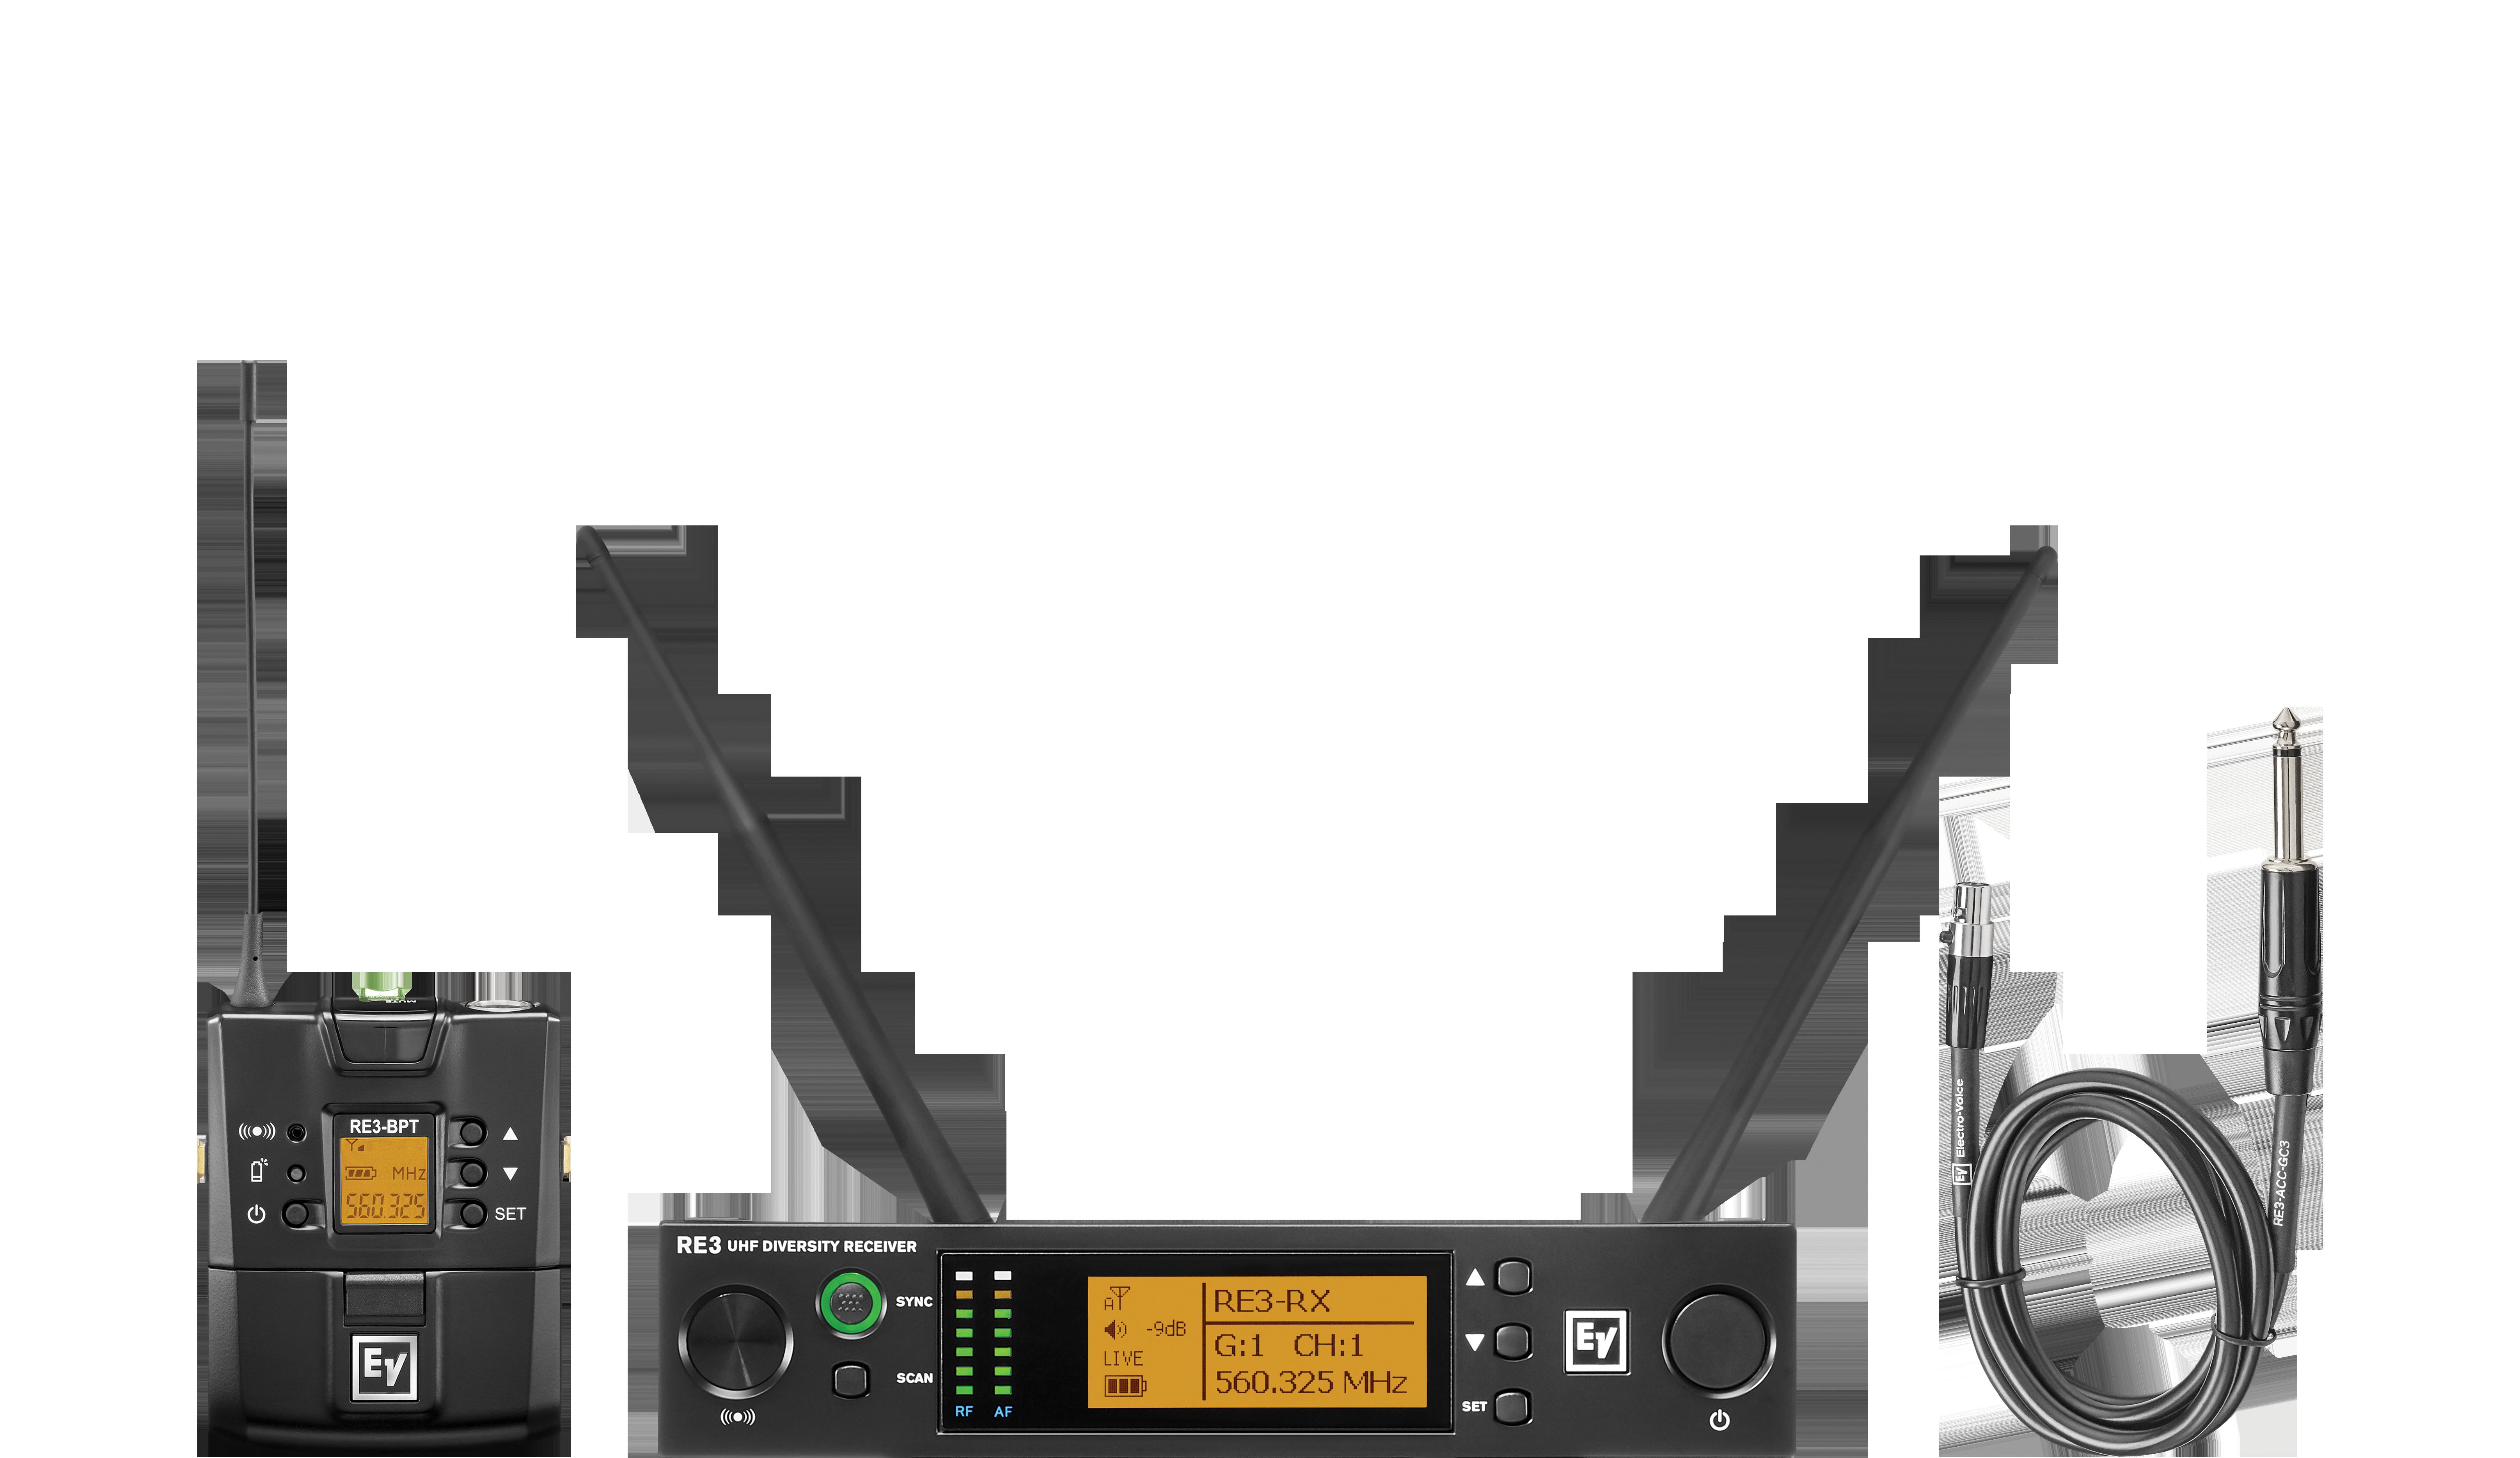 RE3-BPGC-8M - Sistem wireless [1]